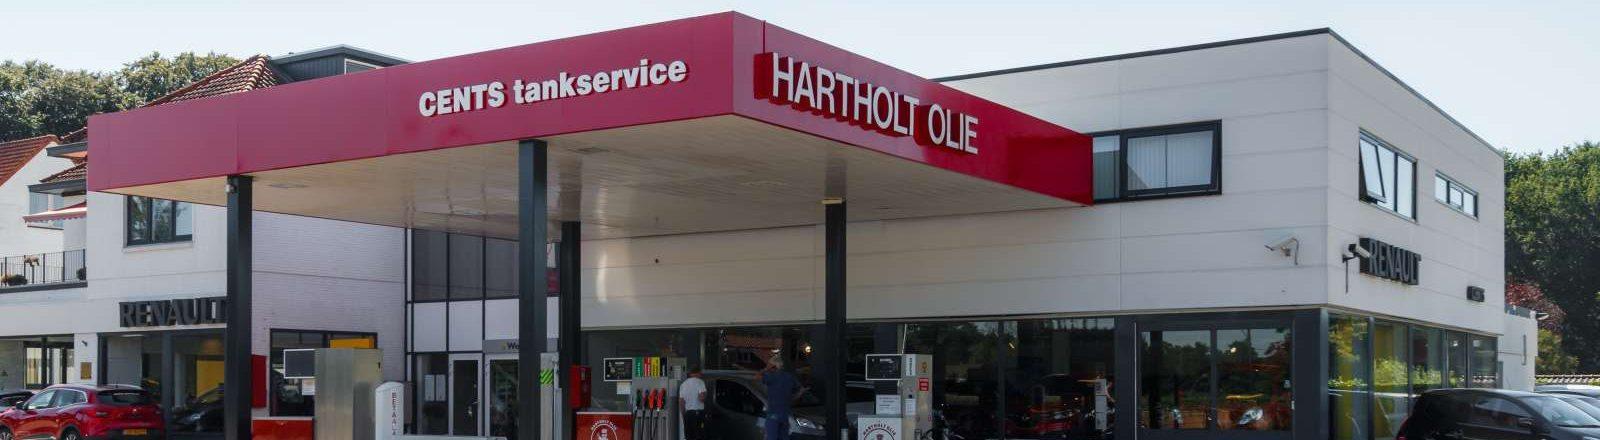 Hartholt Olie tankstation Ommen